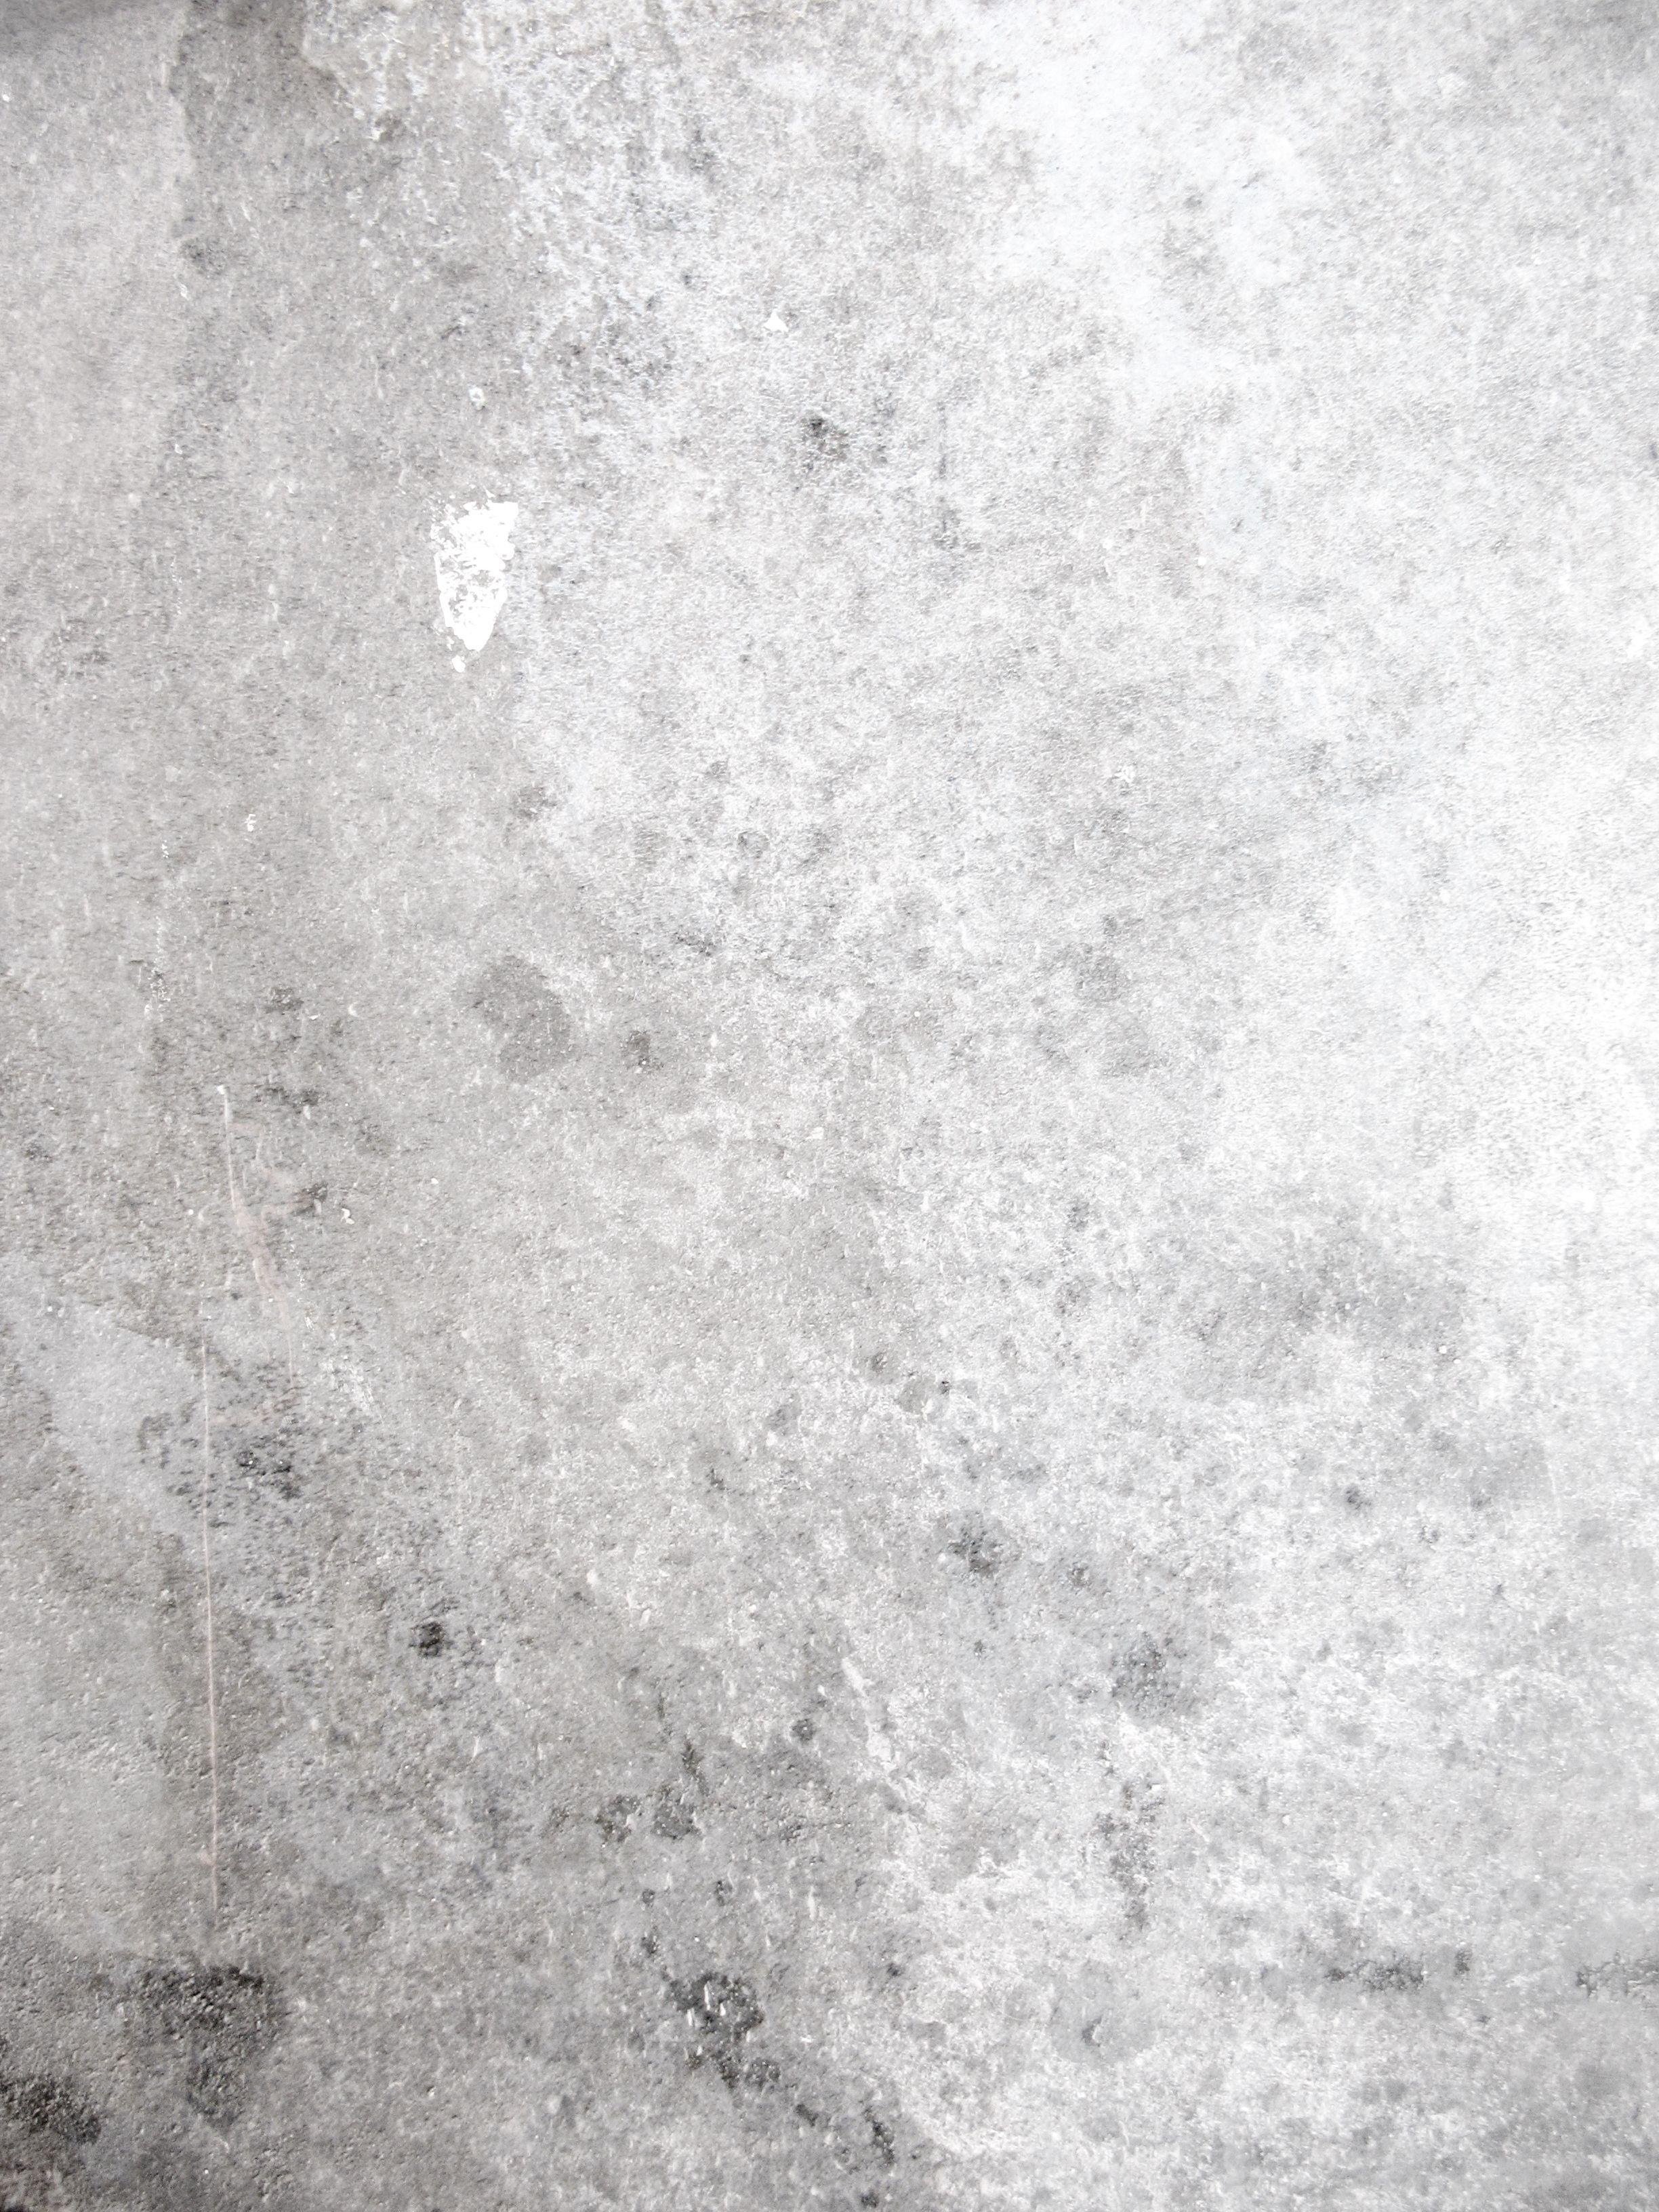 Free Subtle Light Grunge Texture Texture - L+T | Texture | Pinterest ...